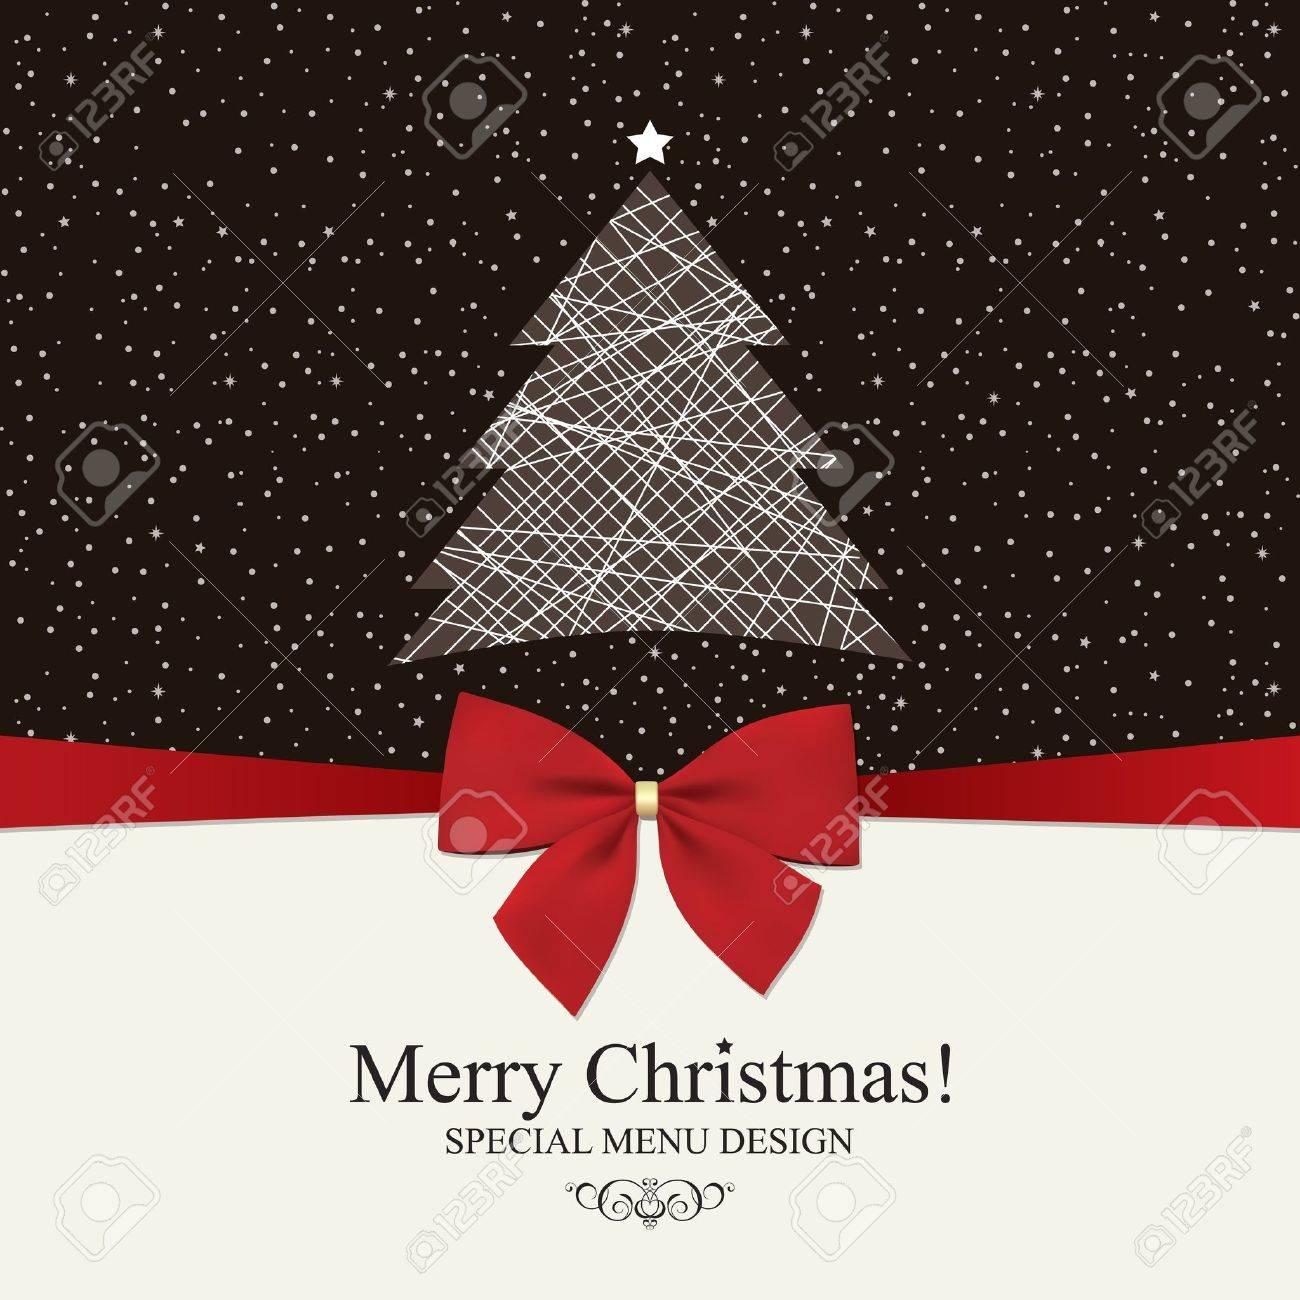 special christmas menu design royalty free cliparts vectors and